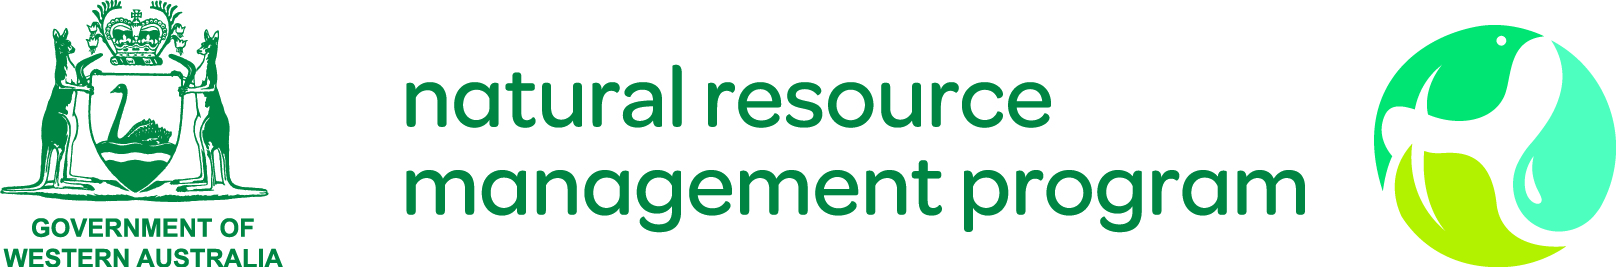 wa_gov_nrmp_logo.jpg